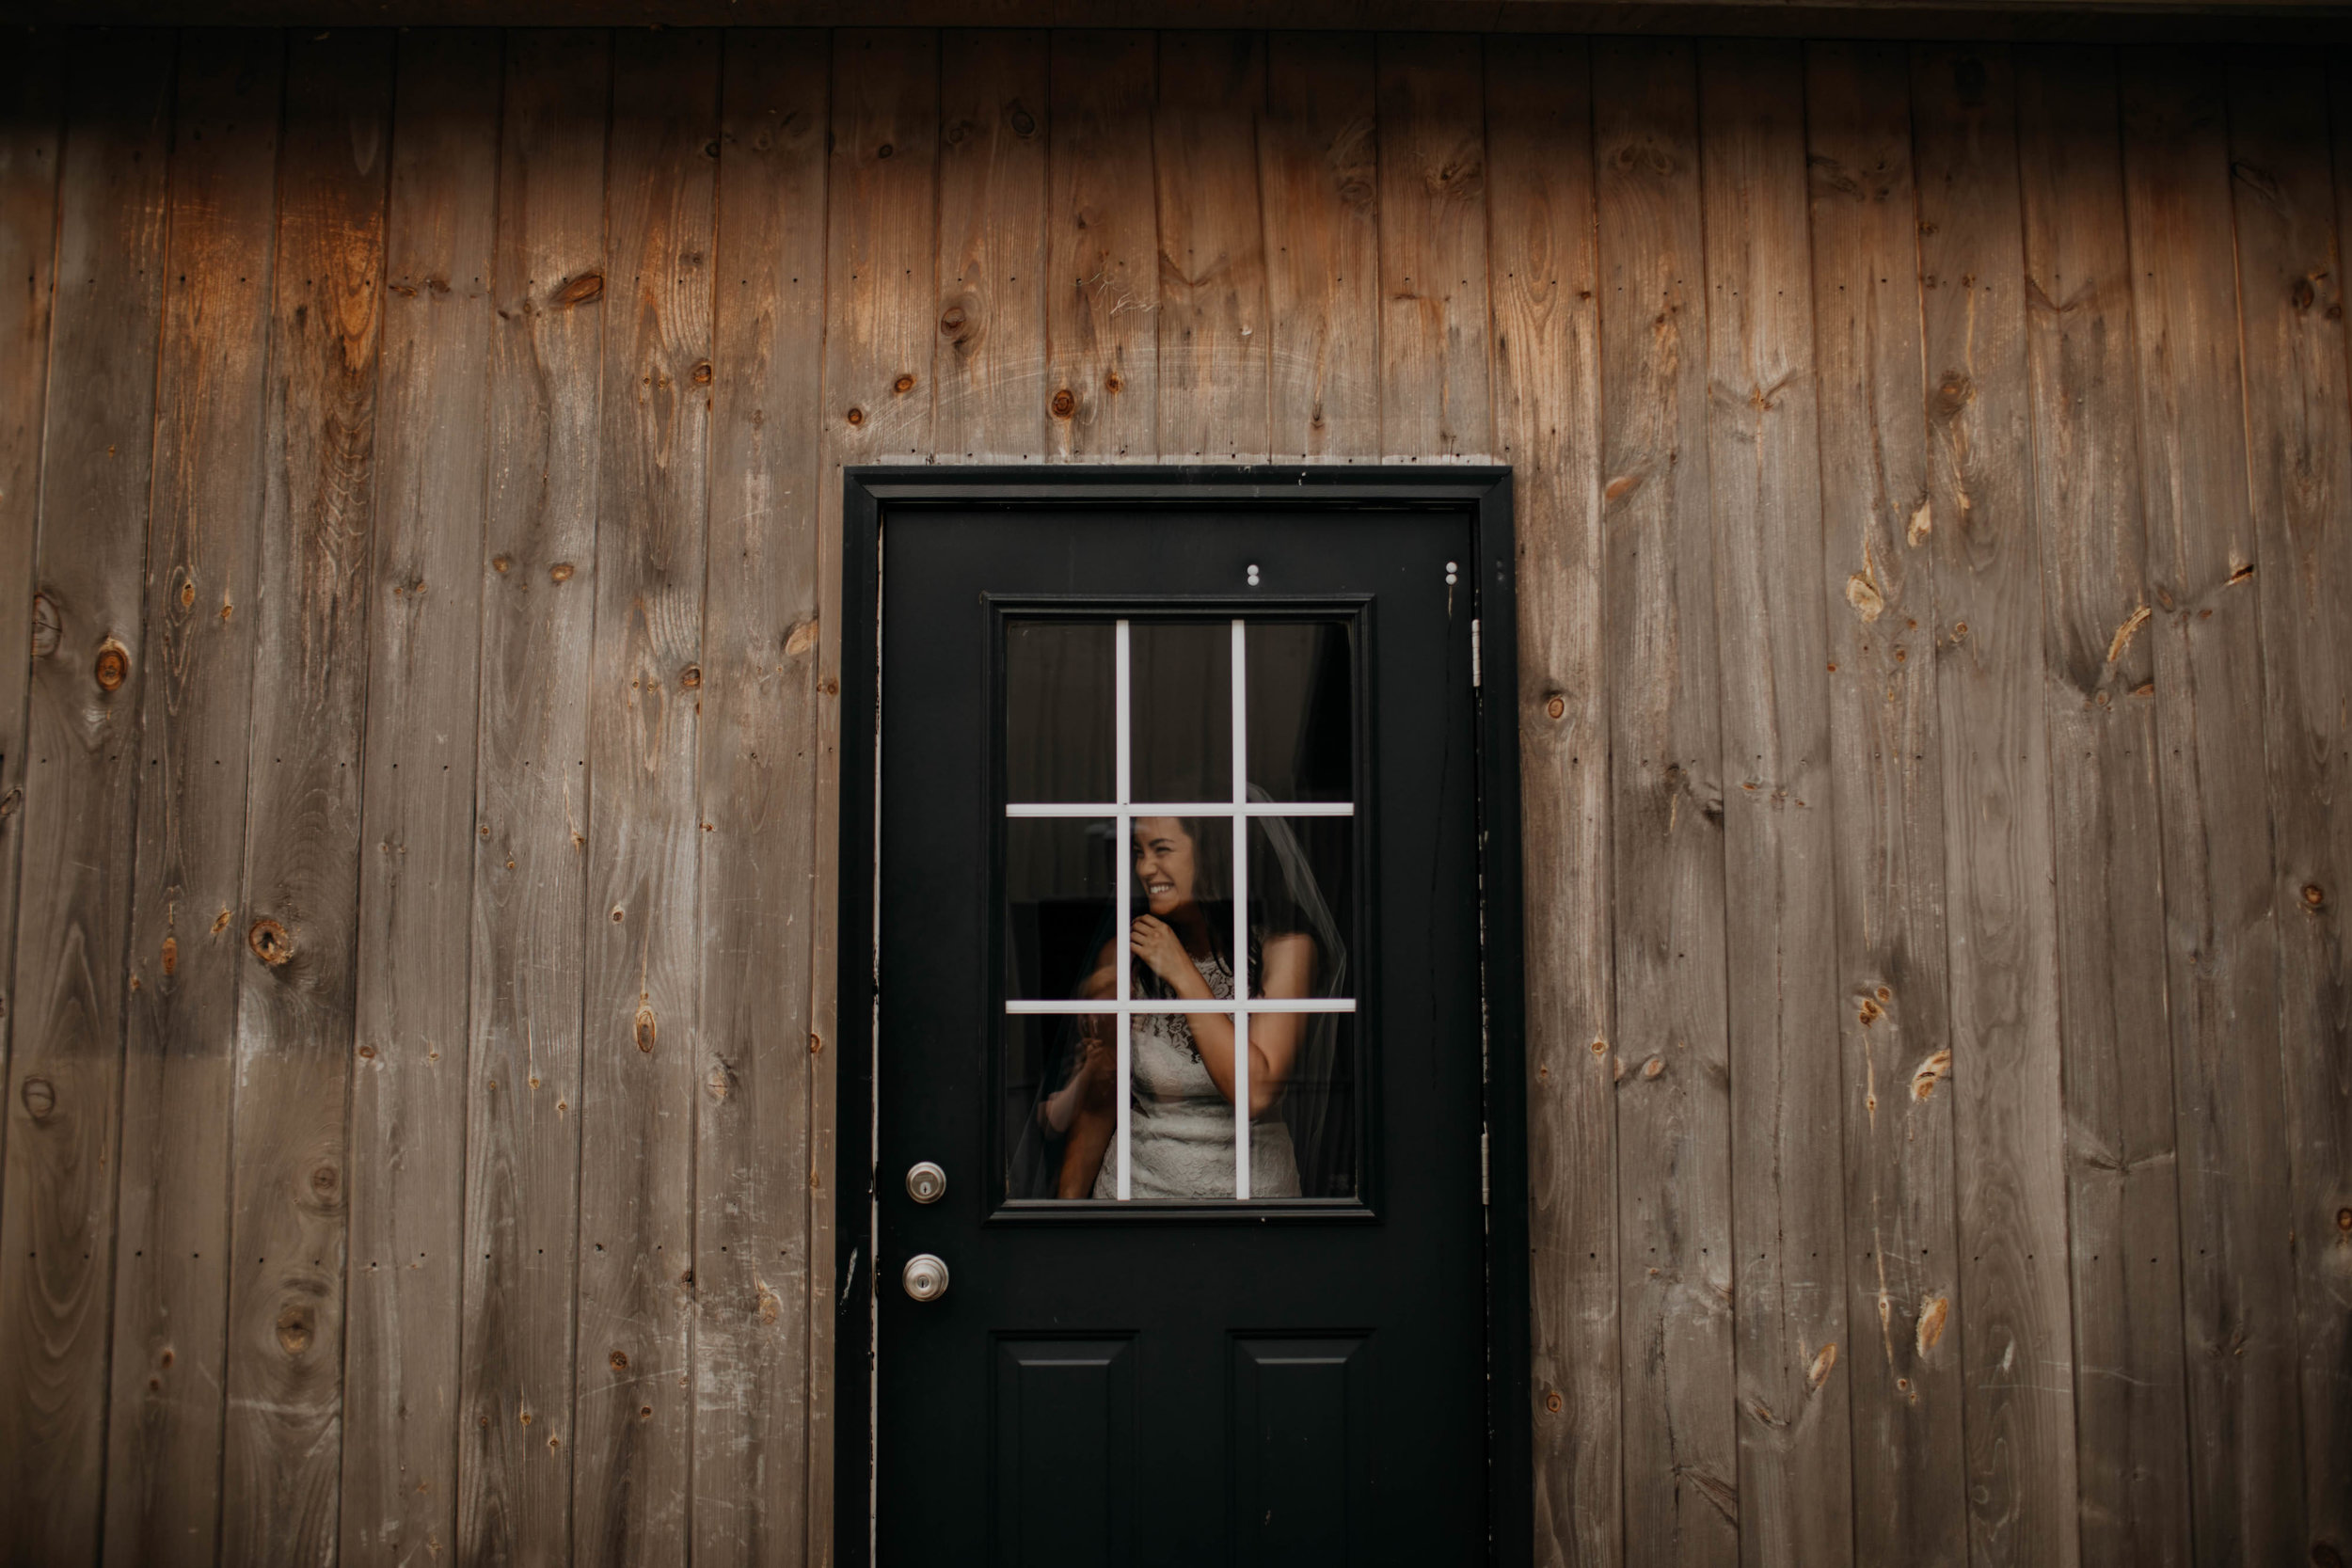 ohio+amish+country+intimate+wedding+rainy+day+wedding19.jpg